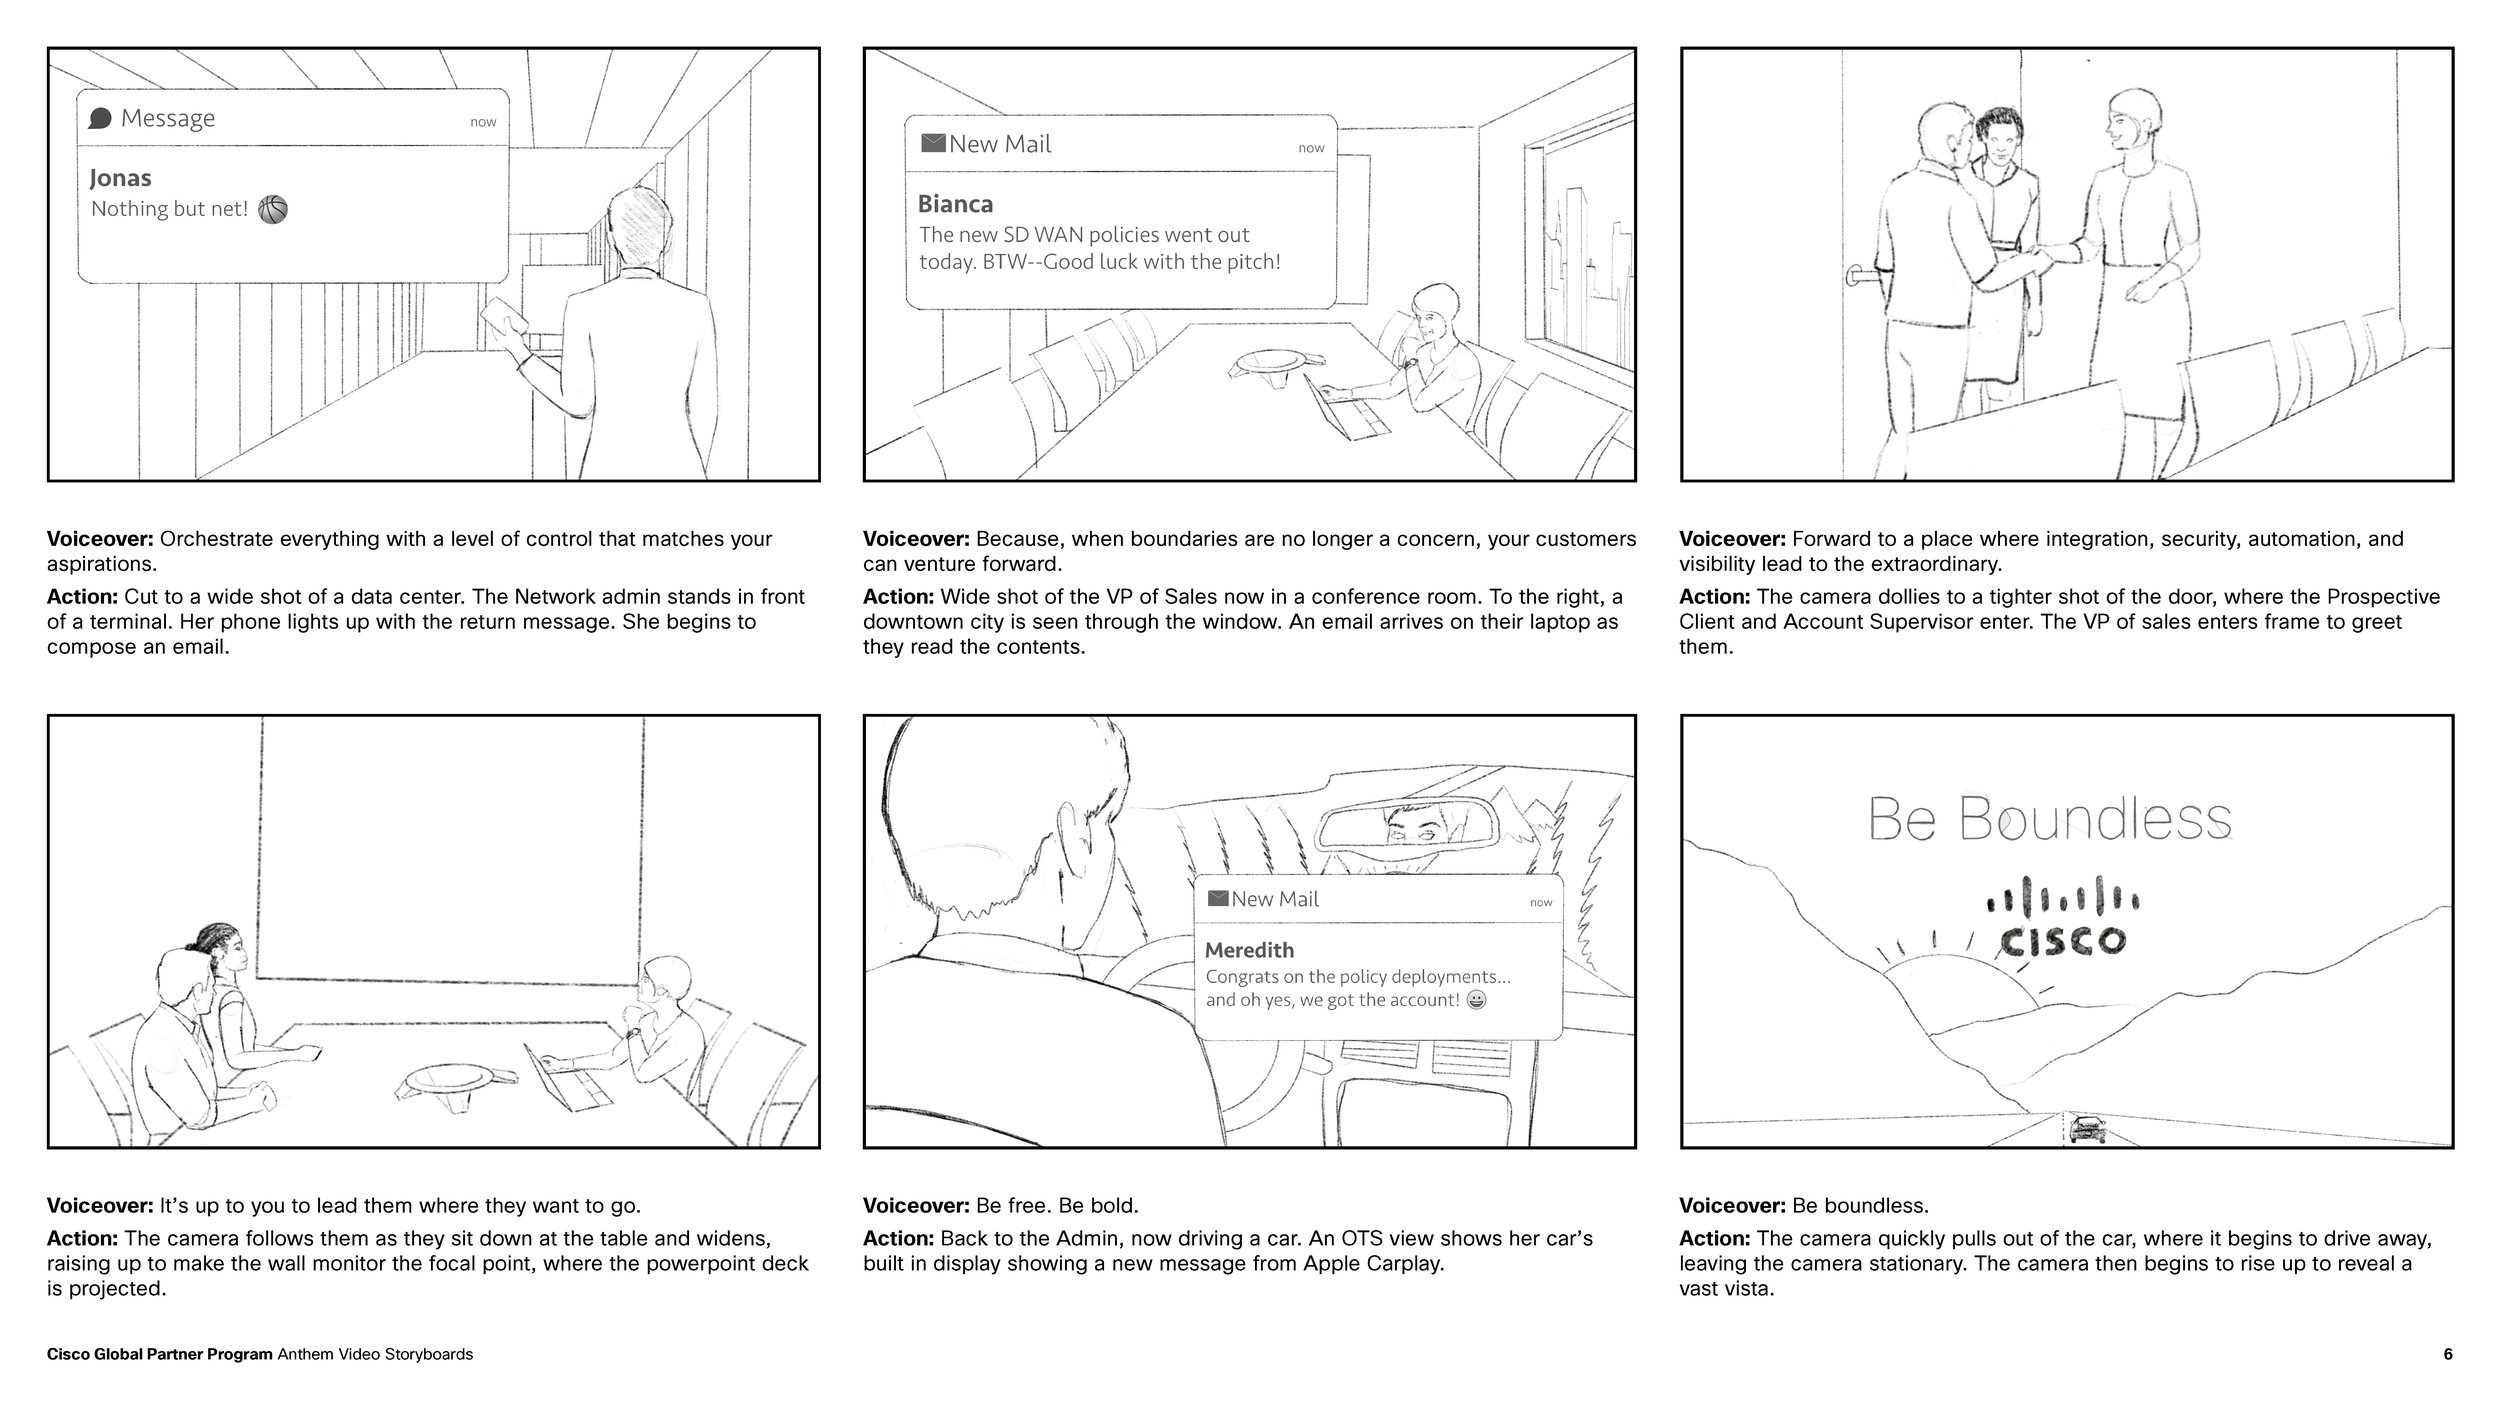 cisco-boundless-anthem-video-storyboards_r1_v2_Page_6.jpg